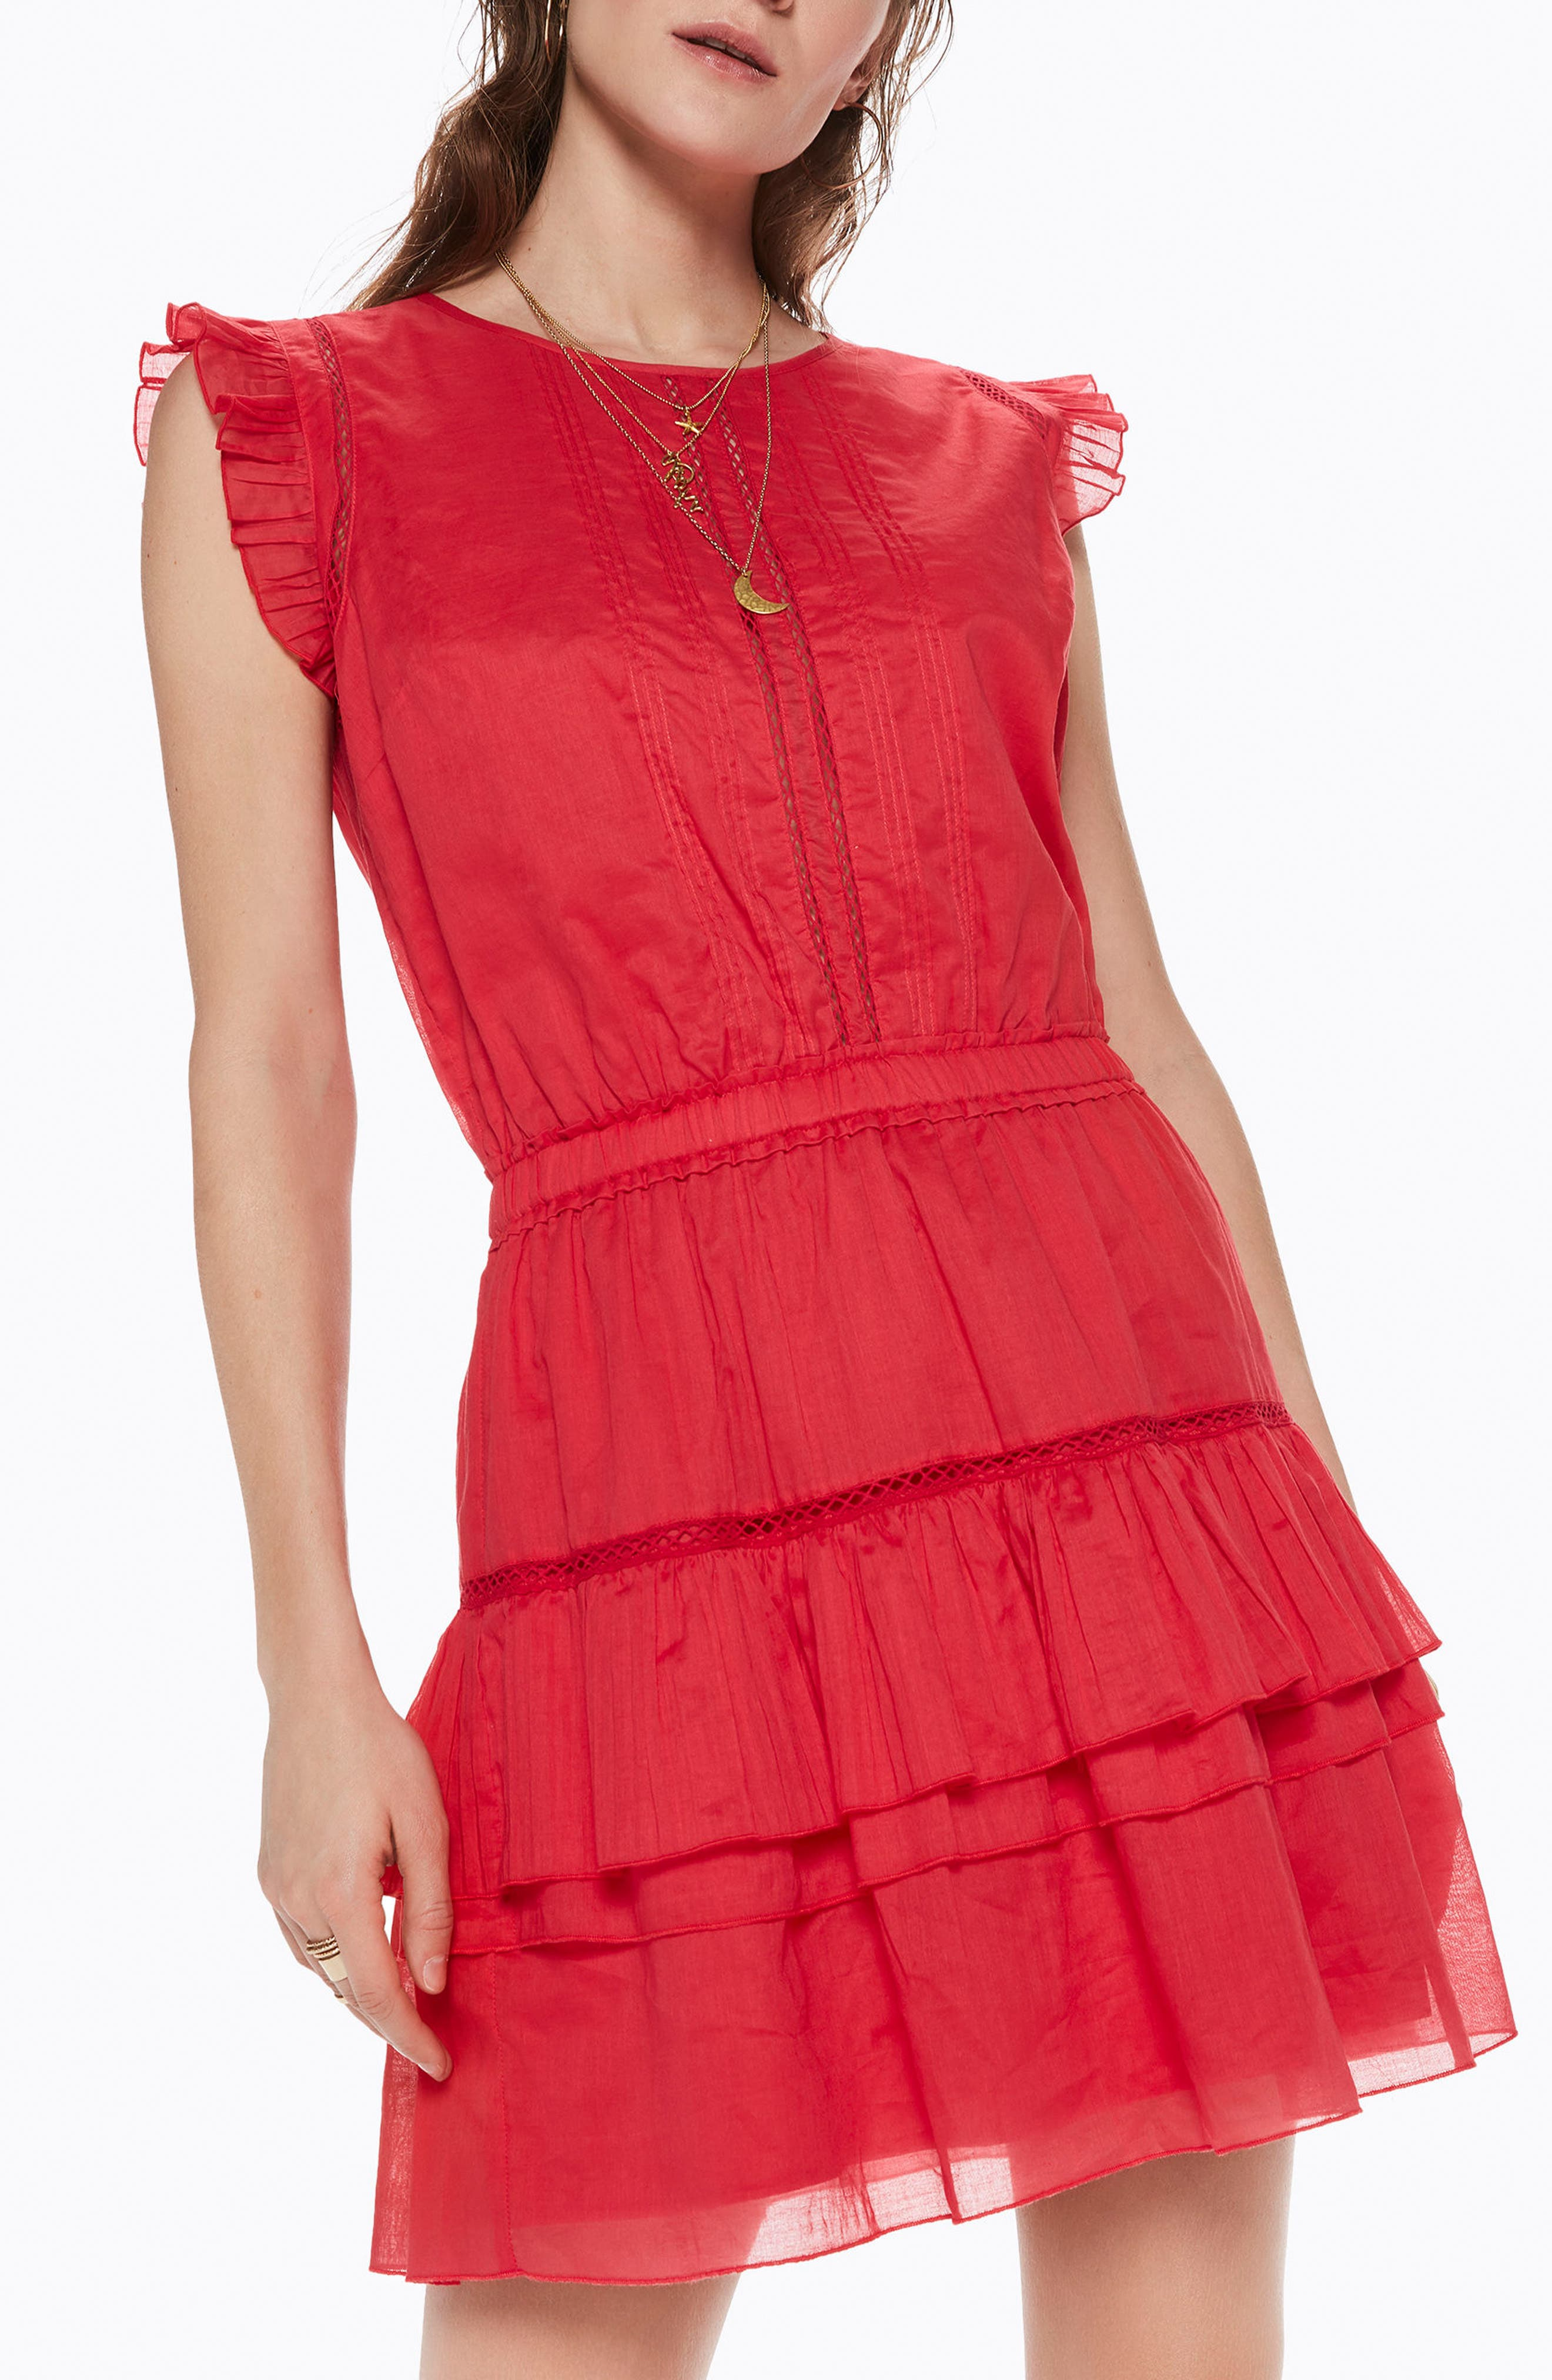 Scotch & Soda Tiered Sleeveless Dress